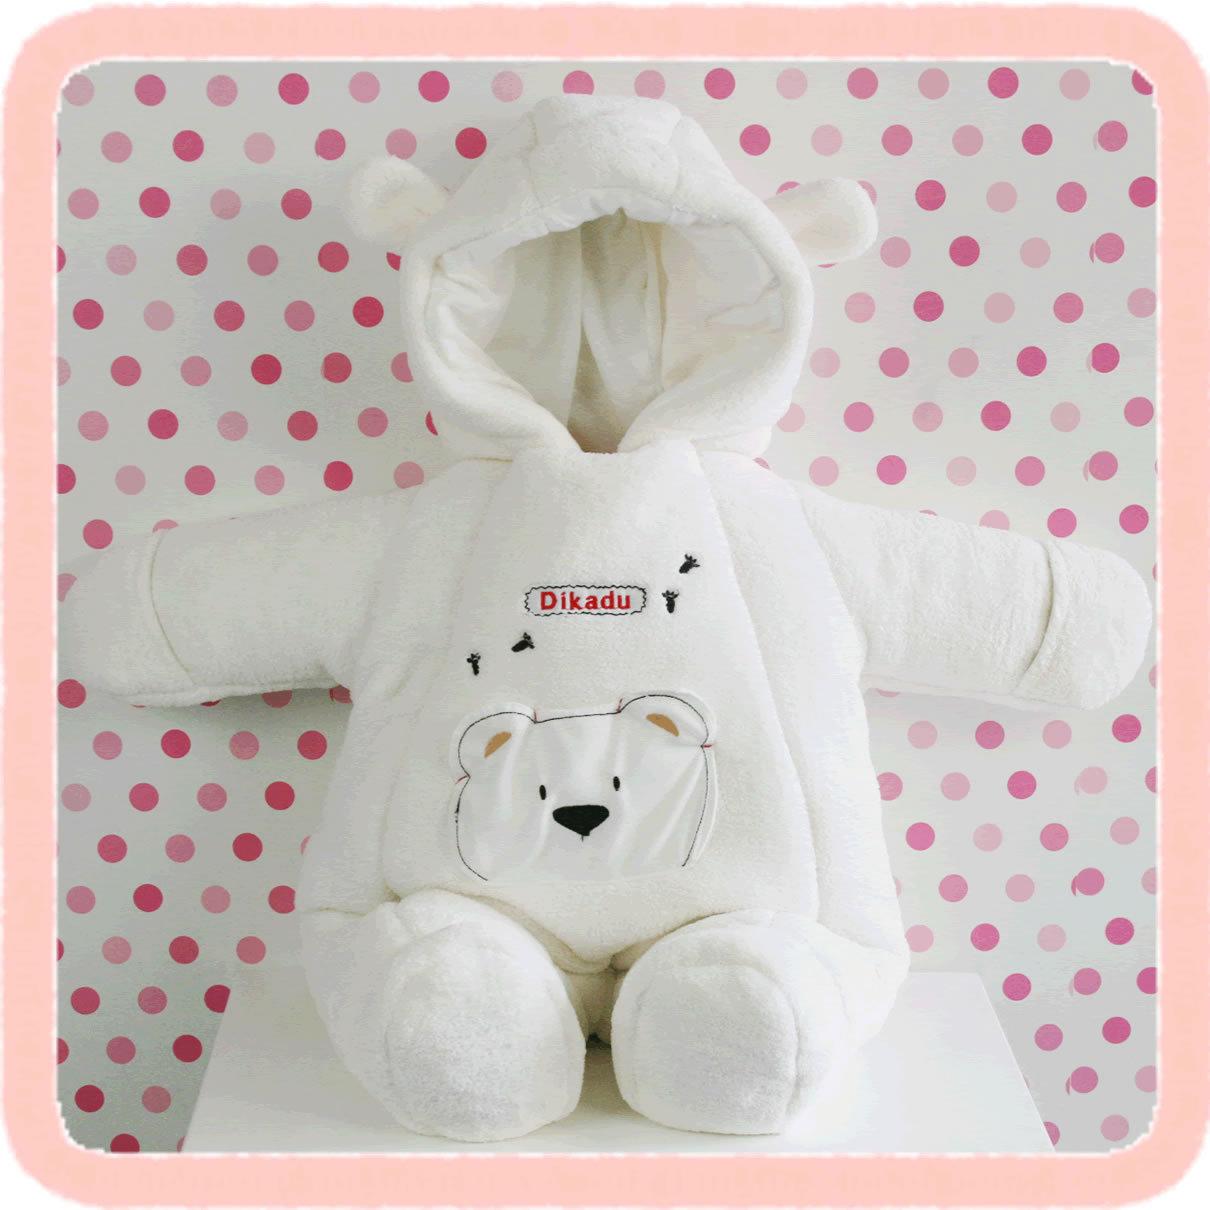 winter warm baby soft velvet romper newborn girl clothing. Black Bedroom Furniture Sets. Home Design Ideas